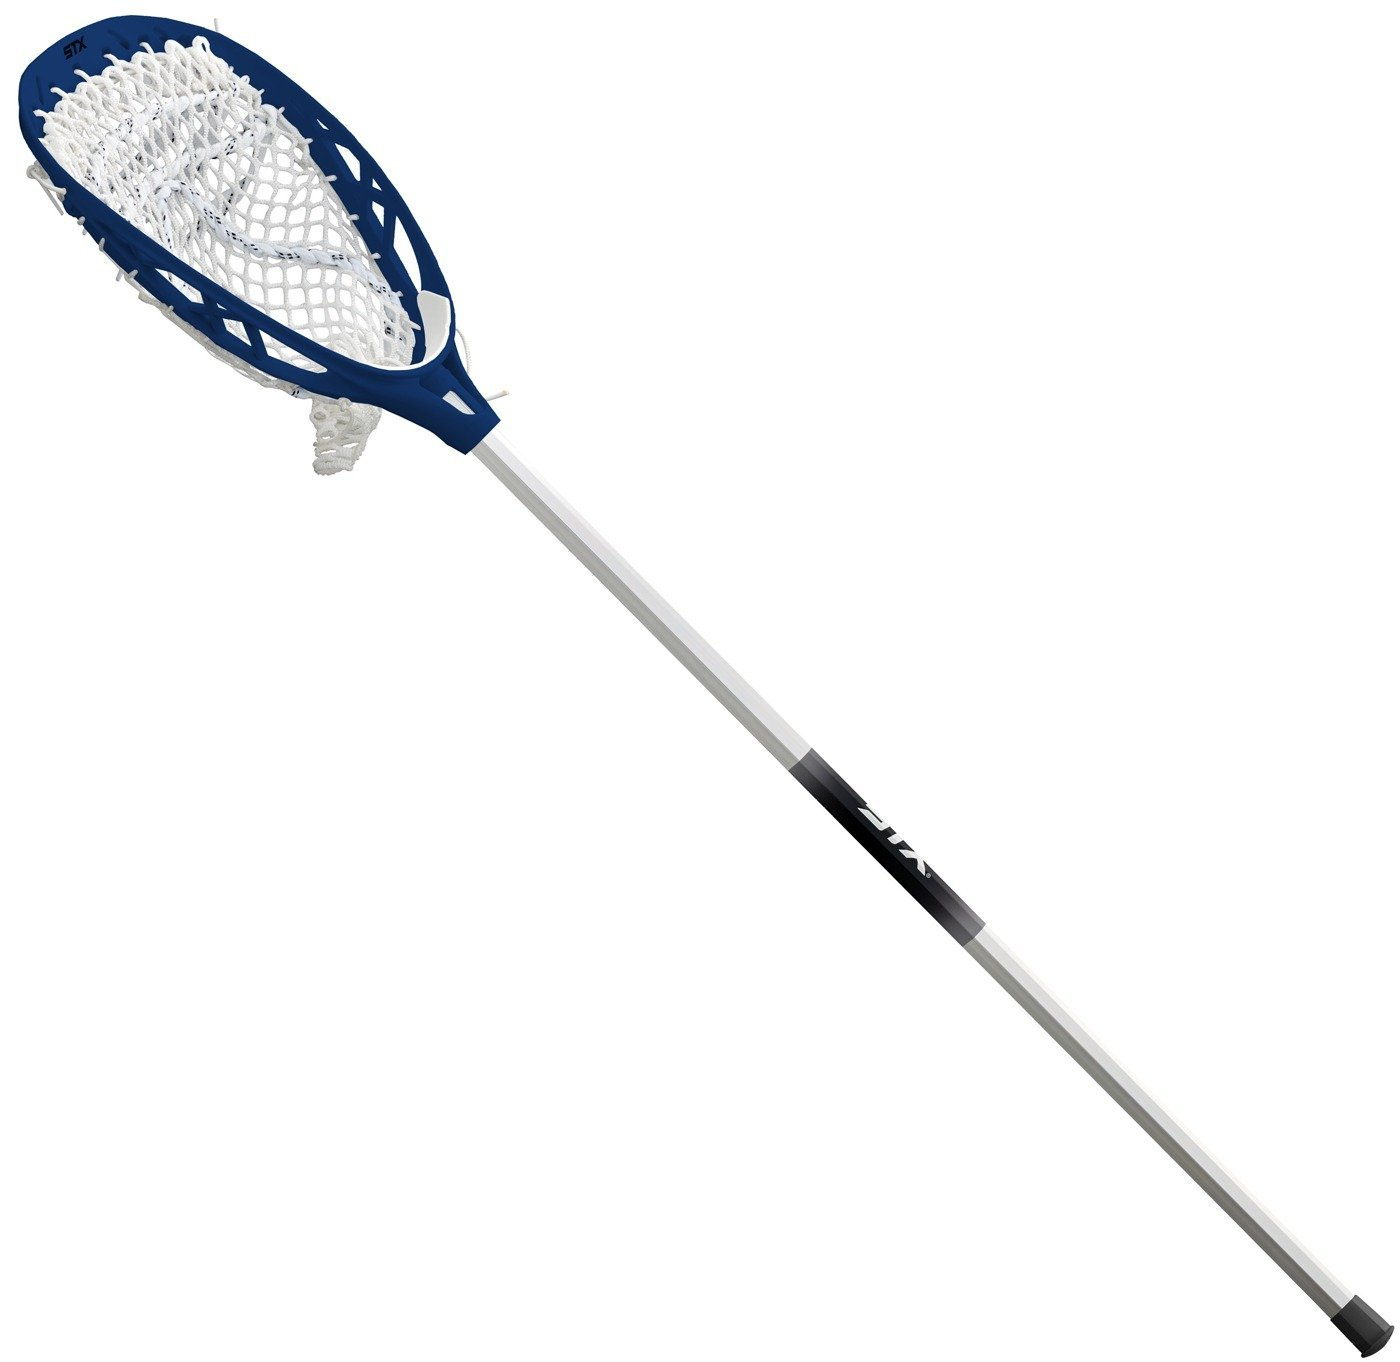 1400x1362 Stx Mini Eclipse Lacrosse Goalie Stick